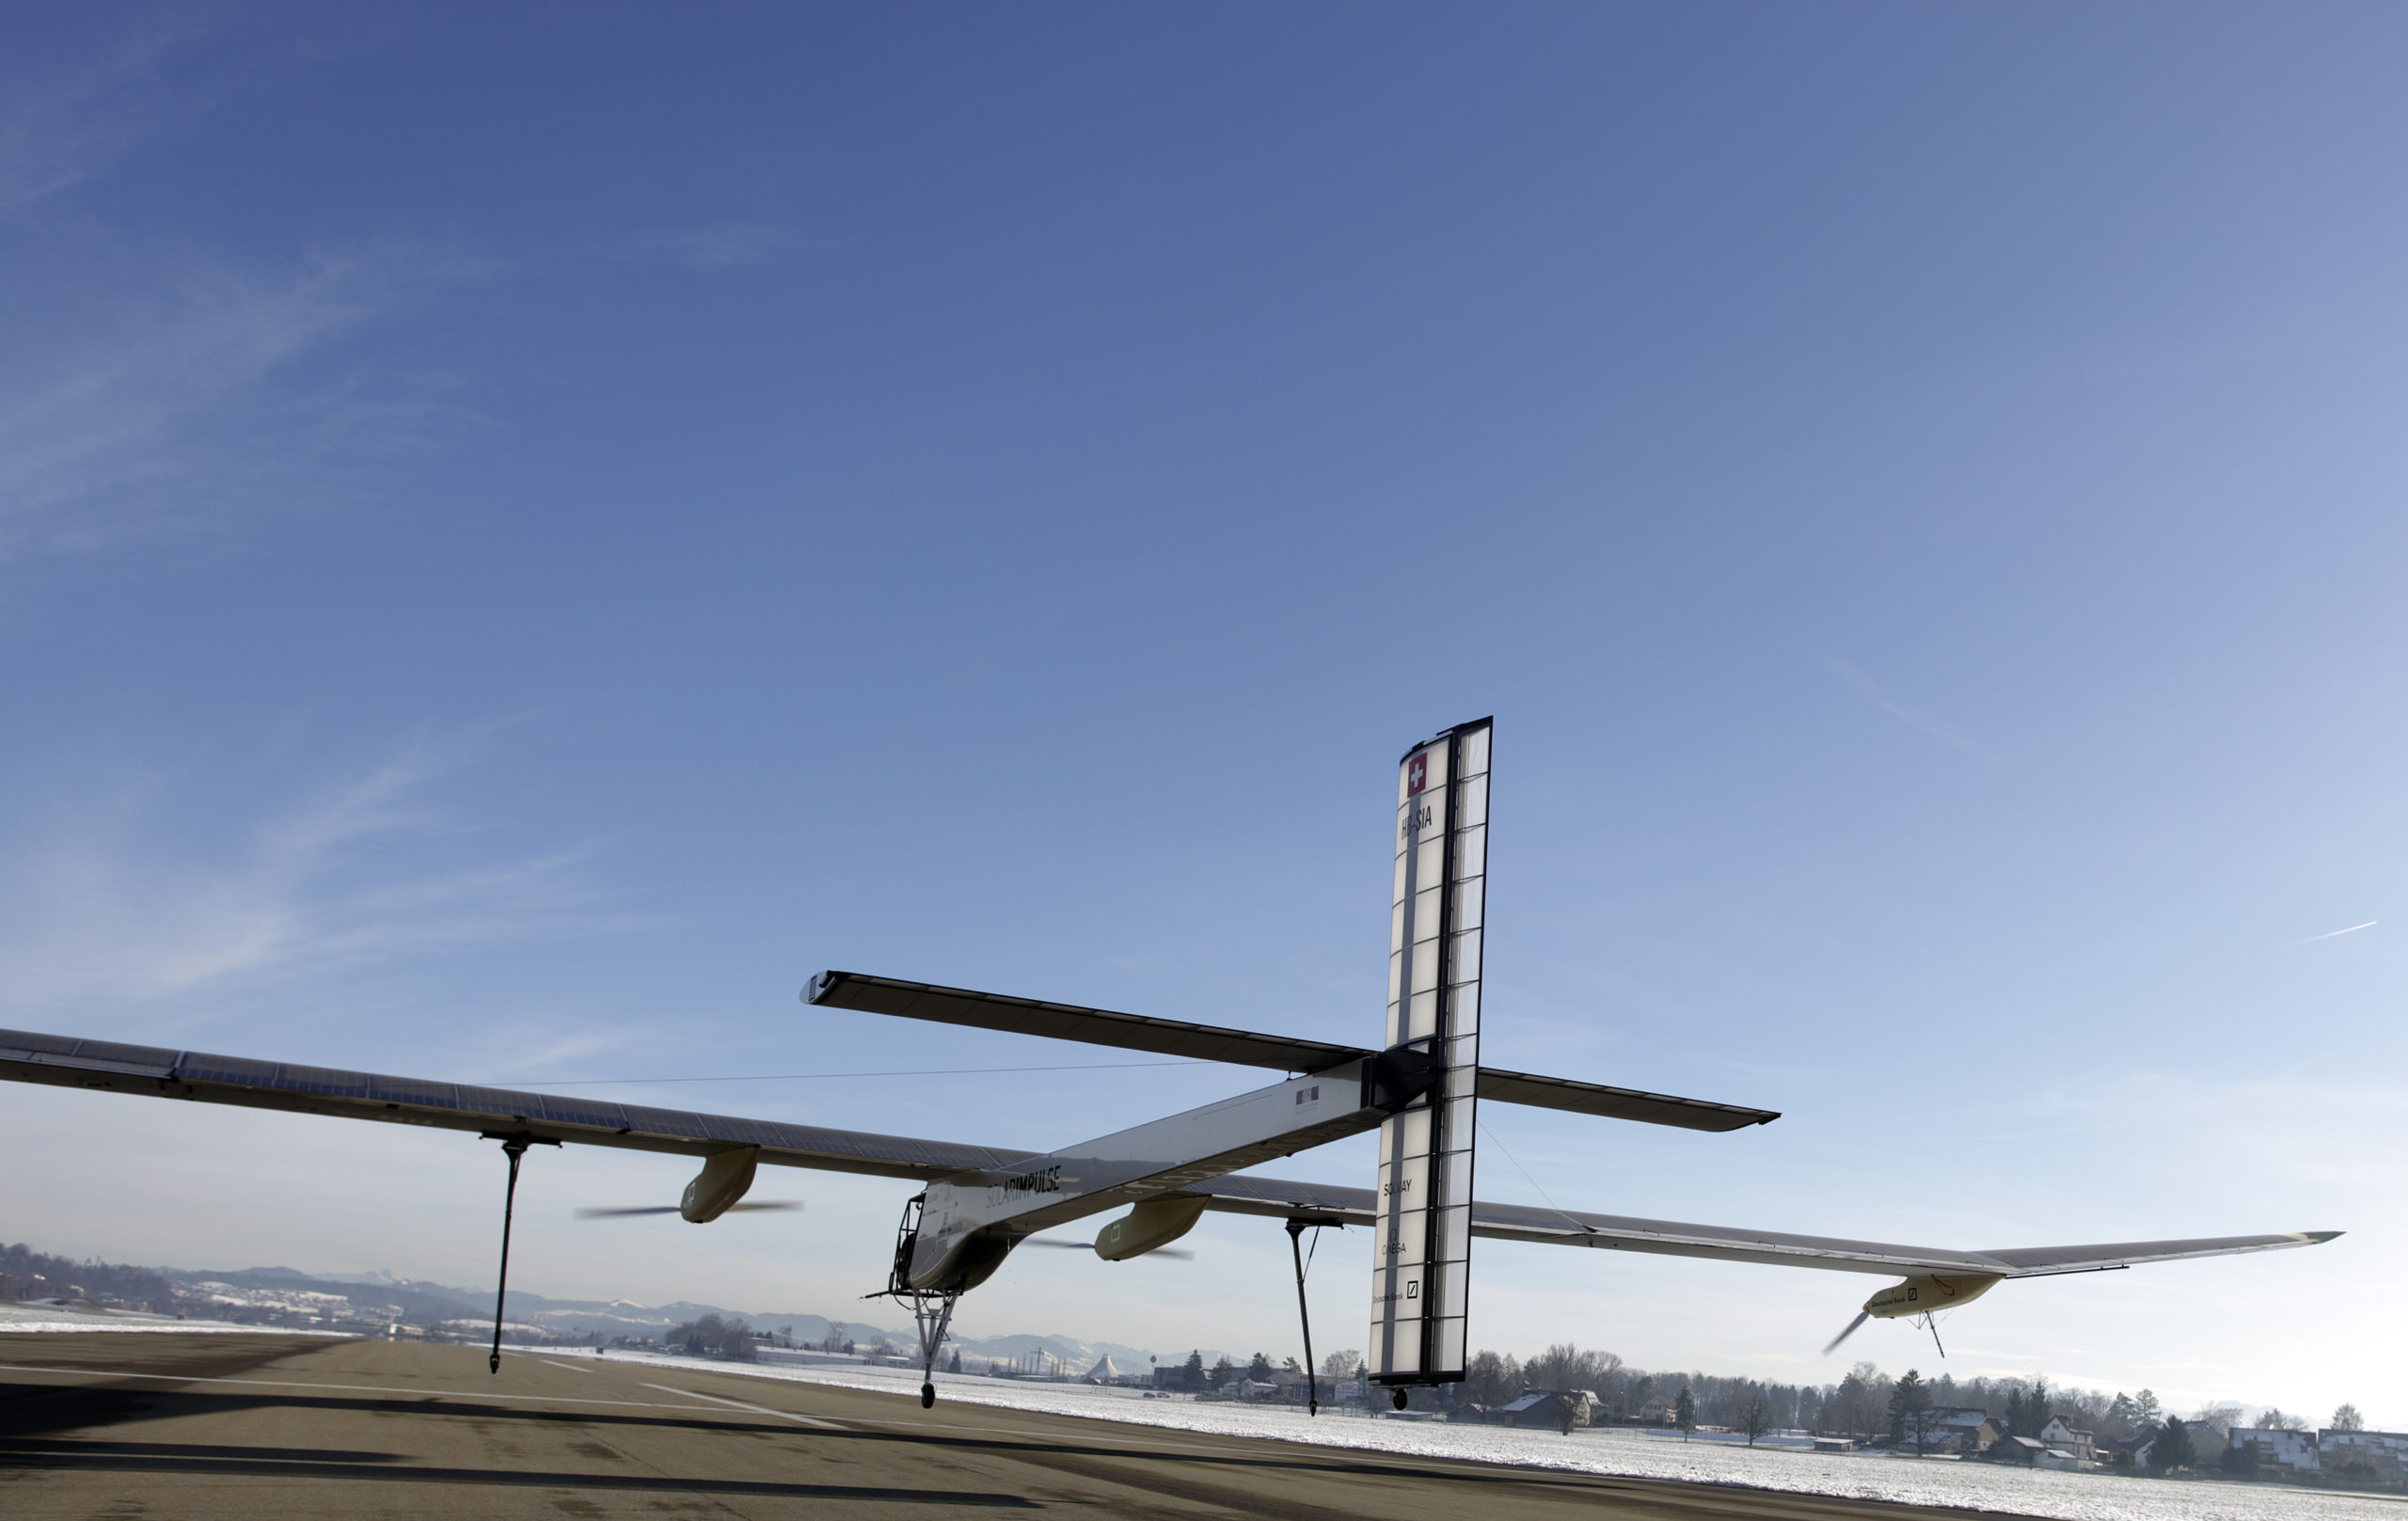 Flea_Hop_HB-SIA_-_Solar_Impulse